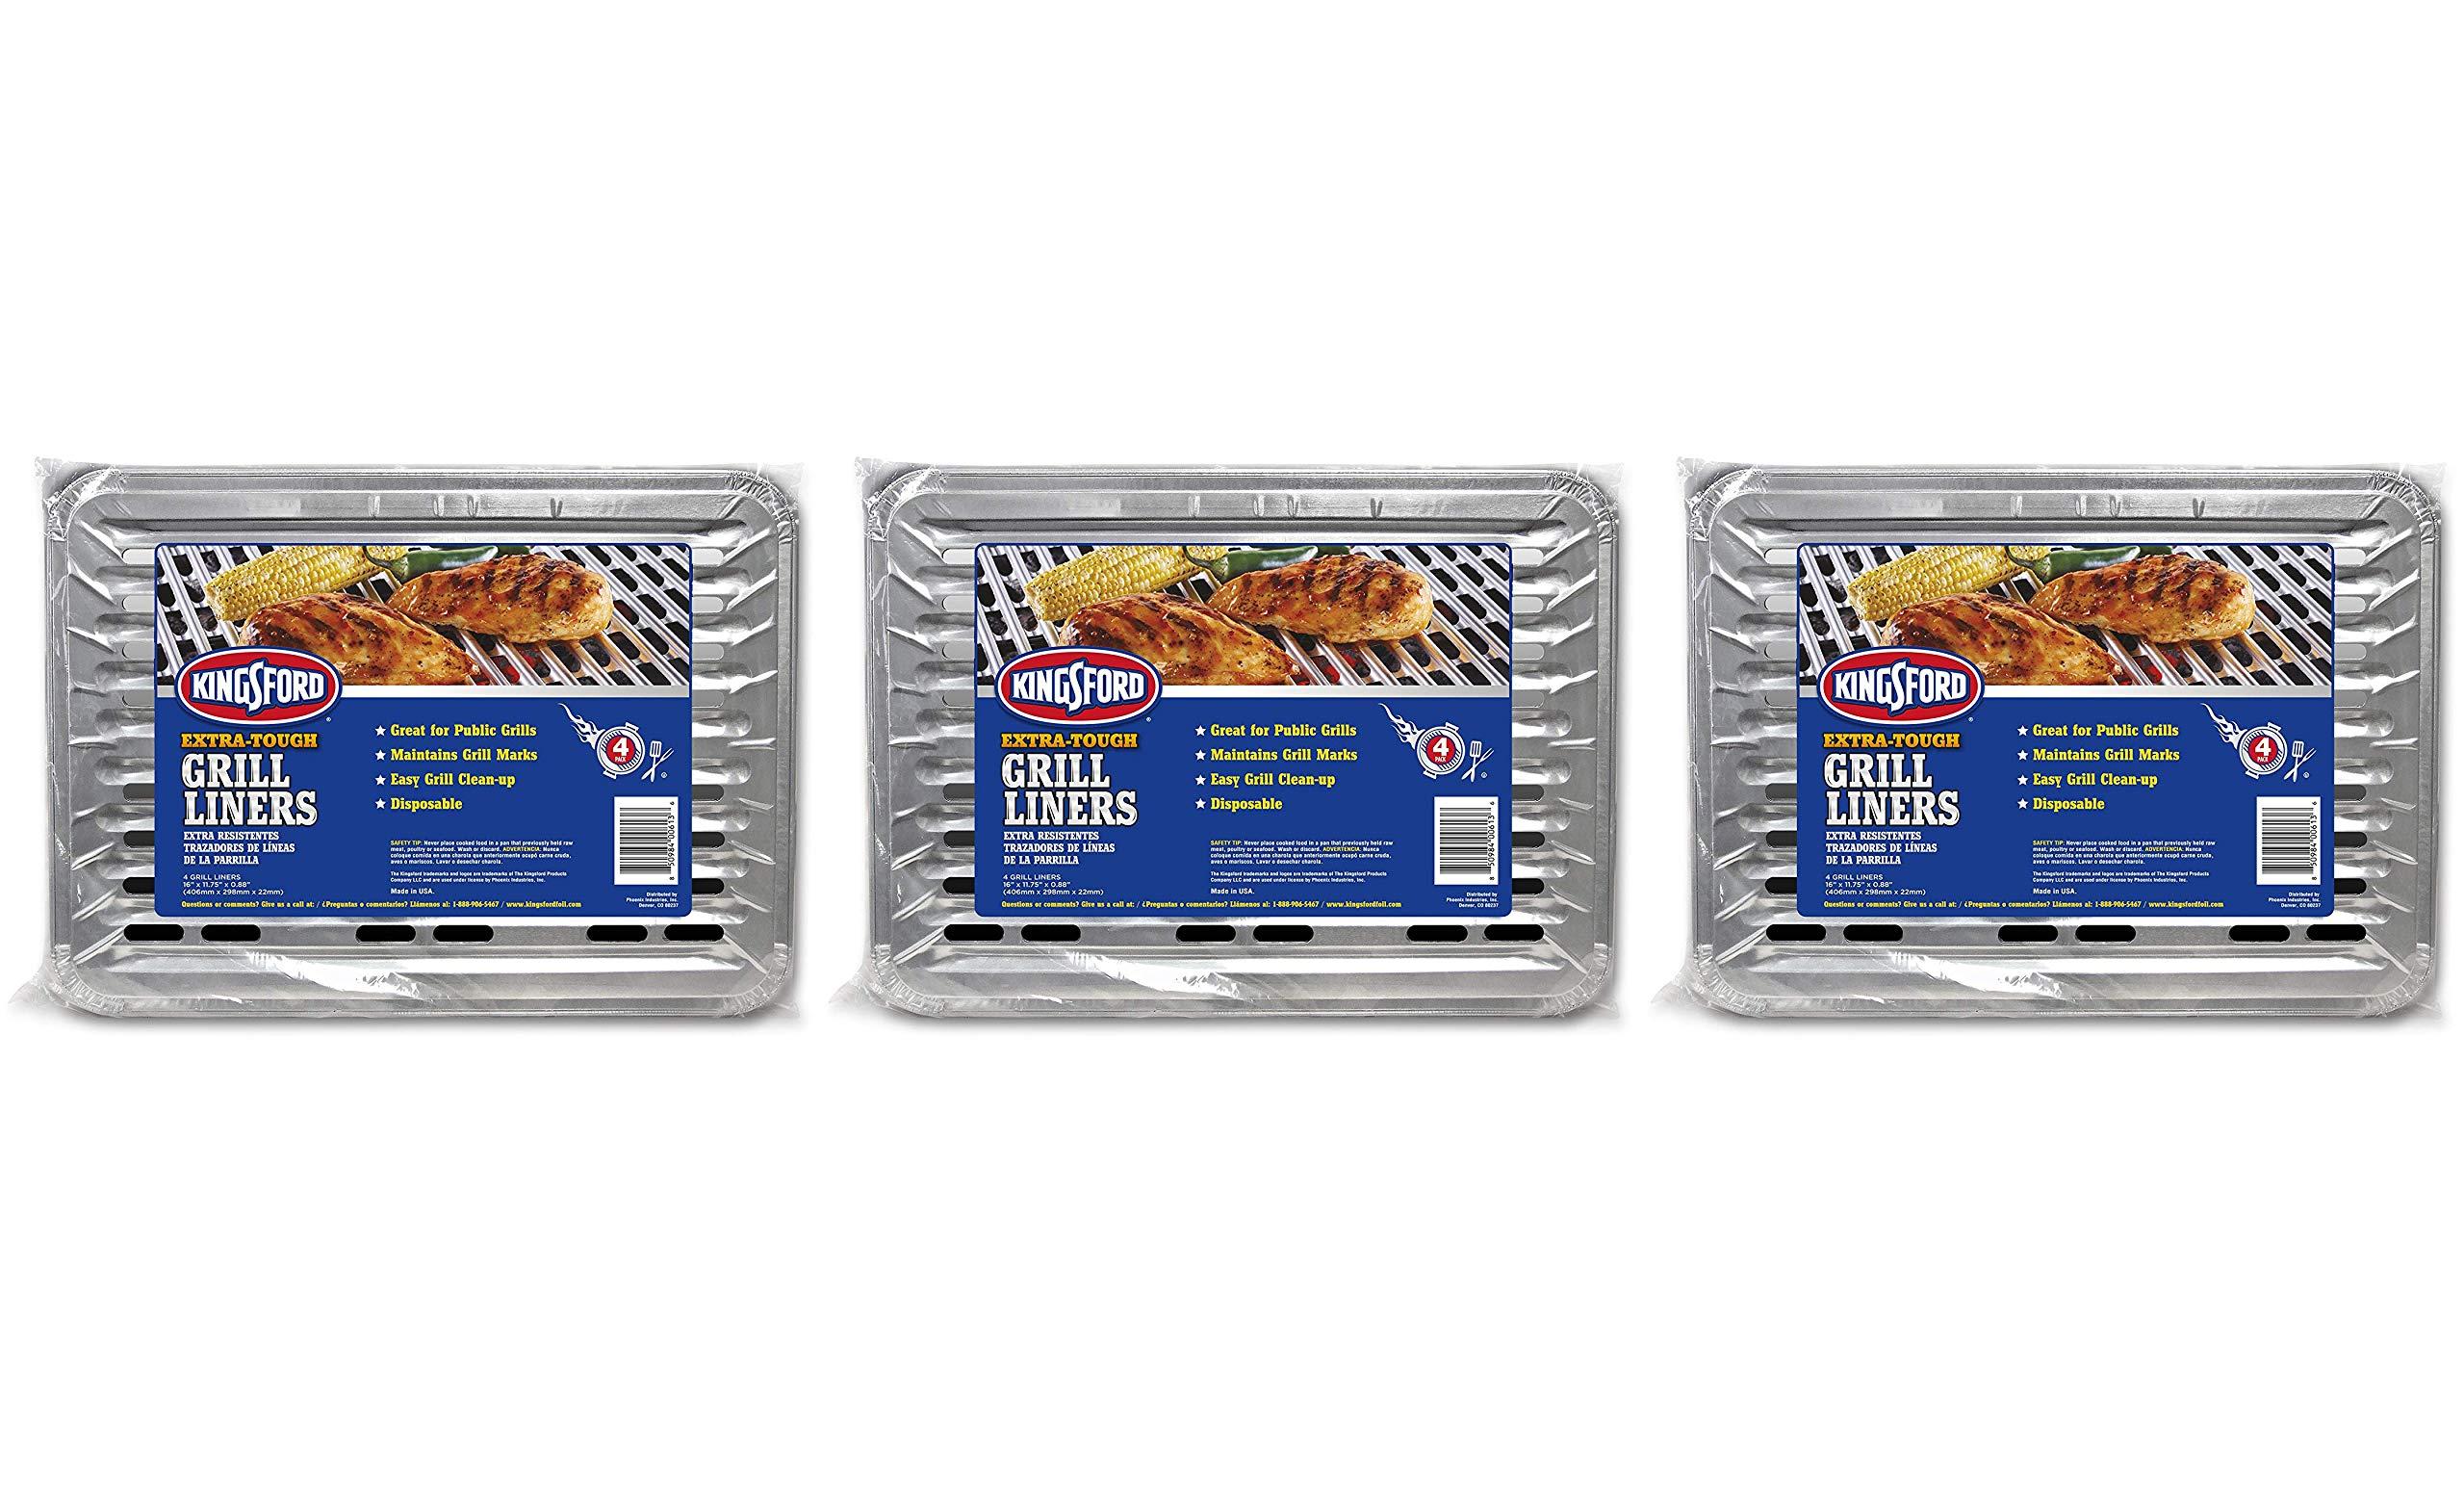 Trinidad Benham 6129994100 Kingsford Extra Tough, 4 Pack Grill Liner, 16'' x 11.75'' x 0.88'' Silver (Тhree Pаck)